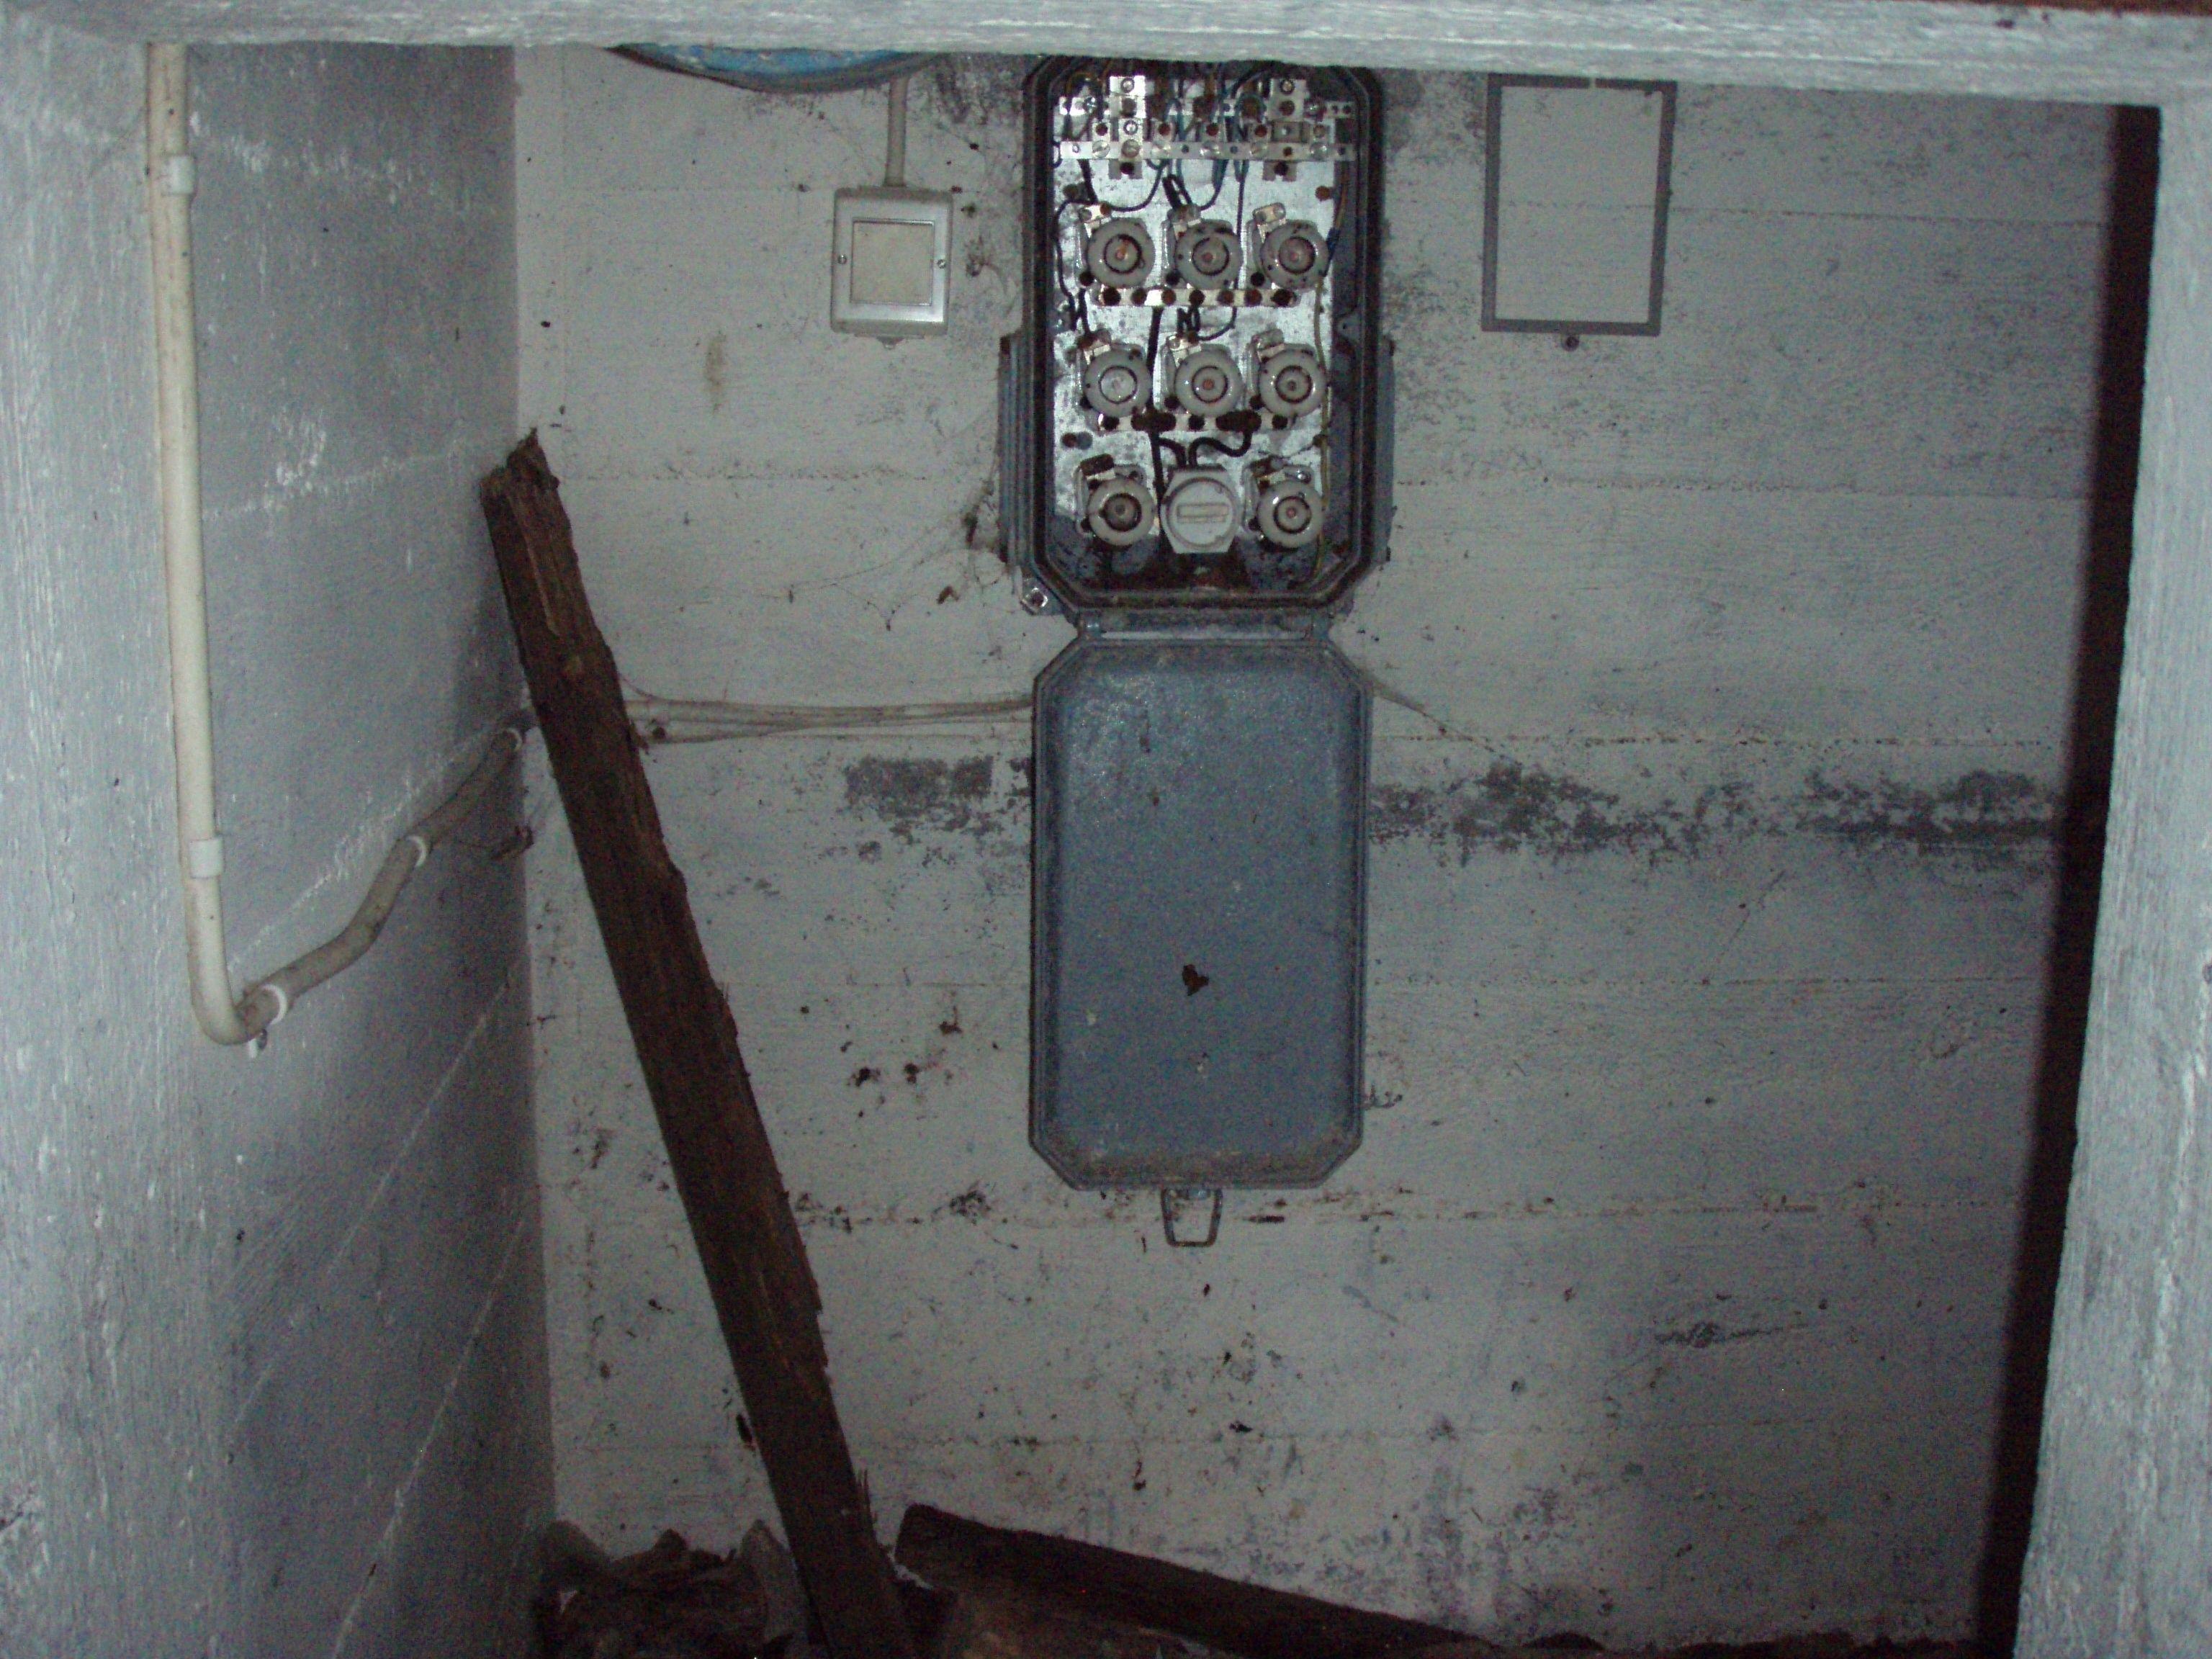 medium resolution of fuse box door handle wiring diagram fuse box door handle